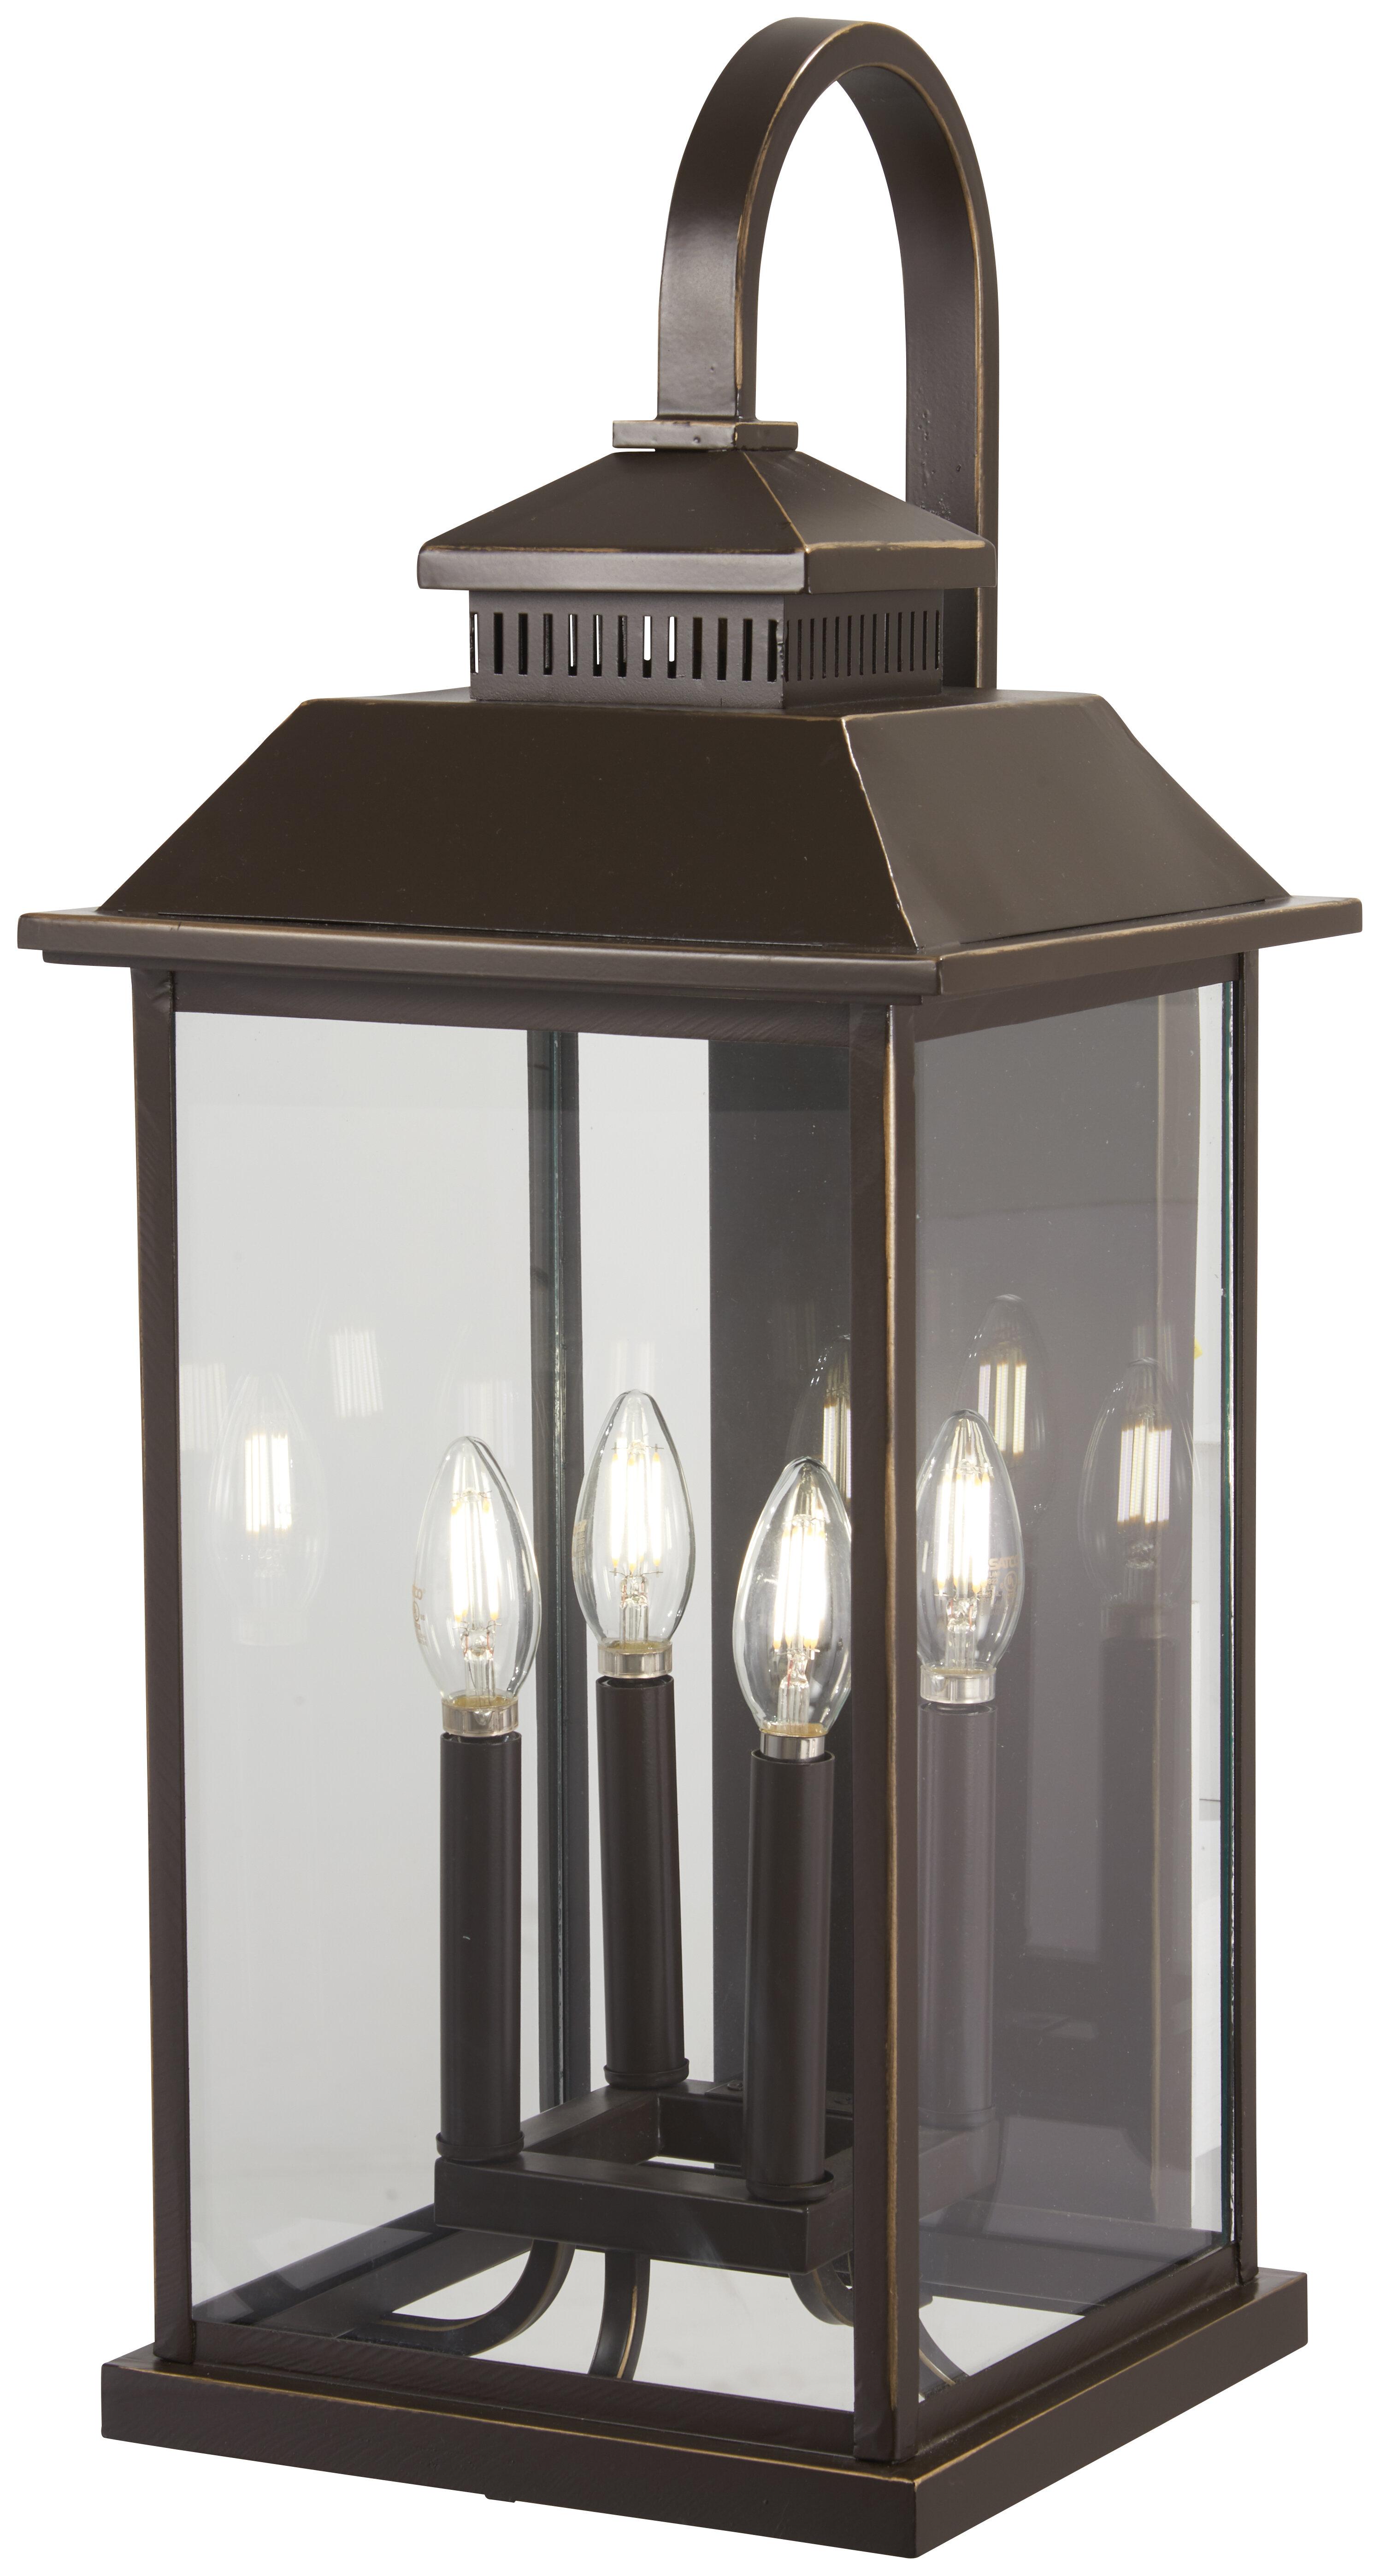 4 Light Lantern Outdoor Wall Lighting You Ll Love In 2021 Wayfair